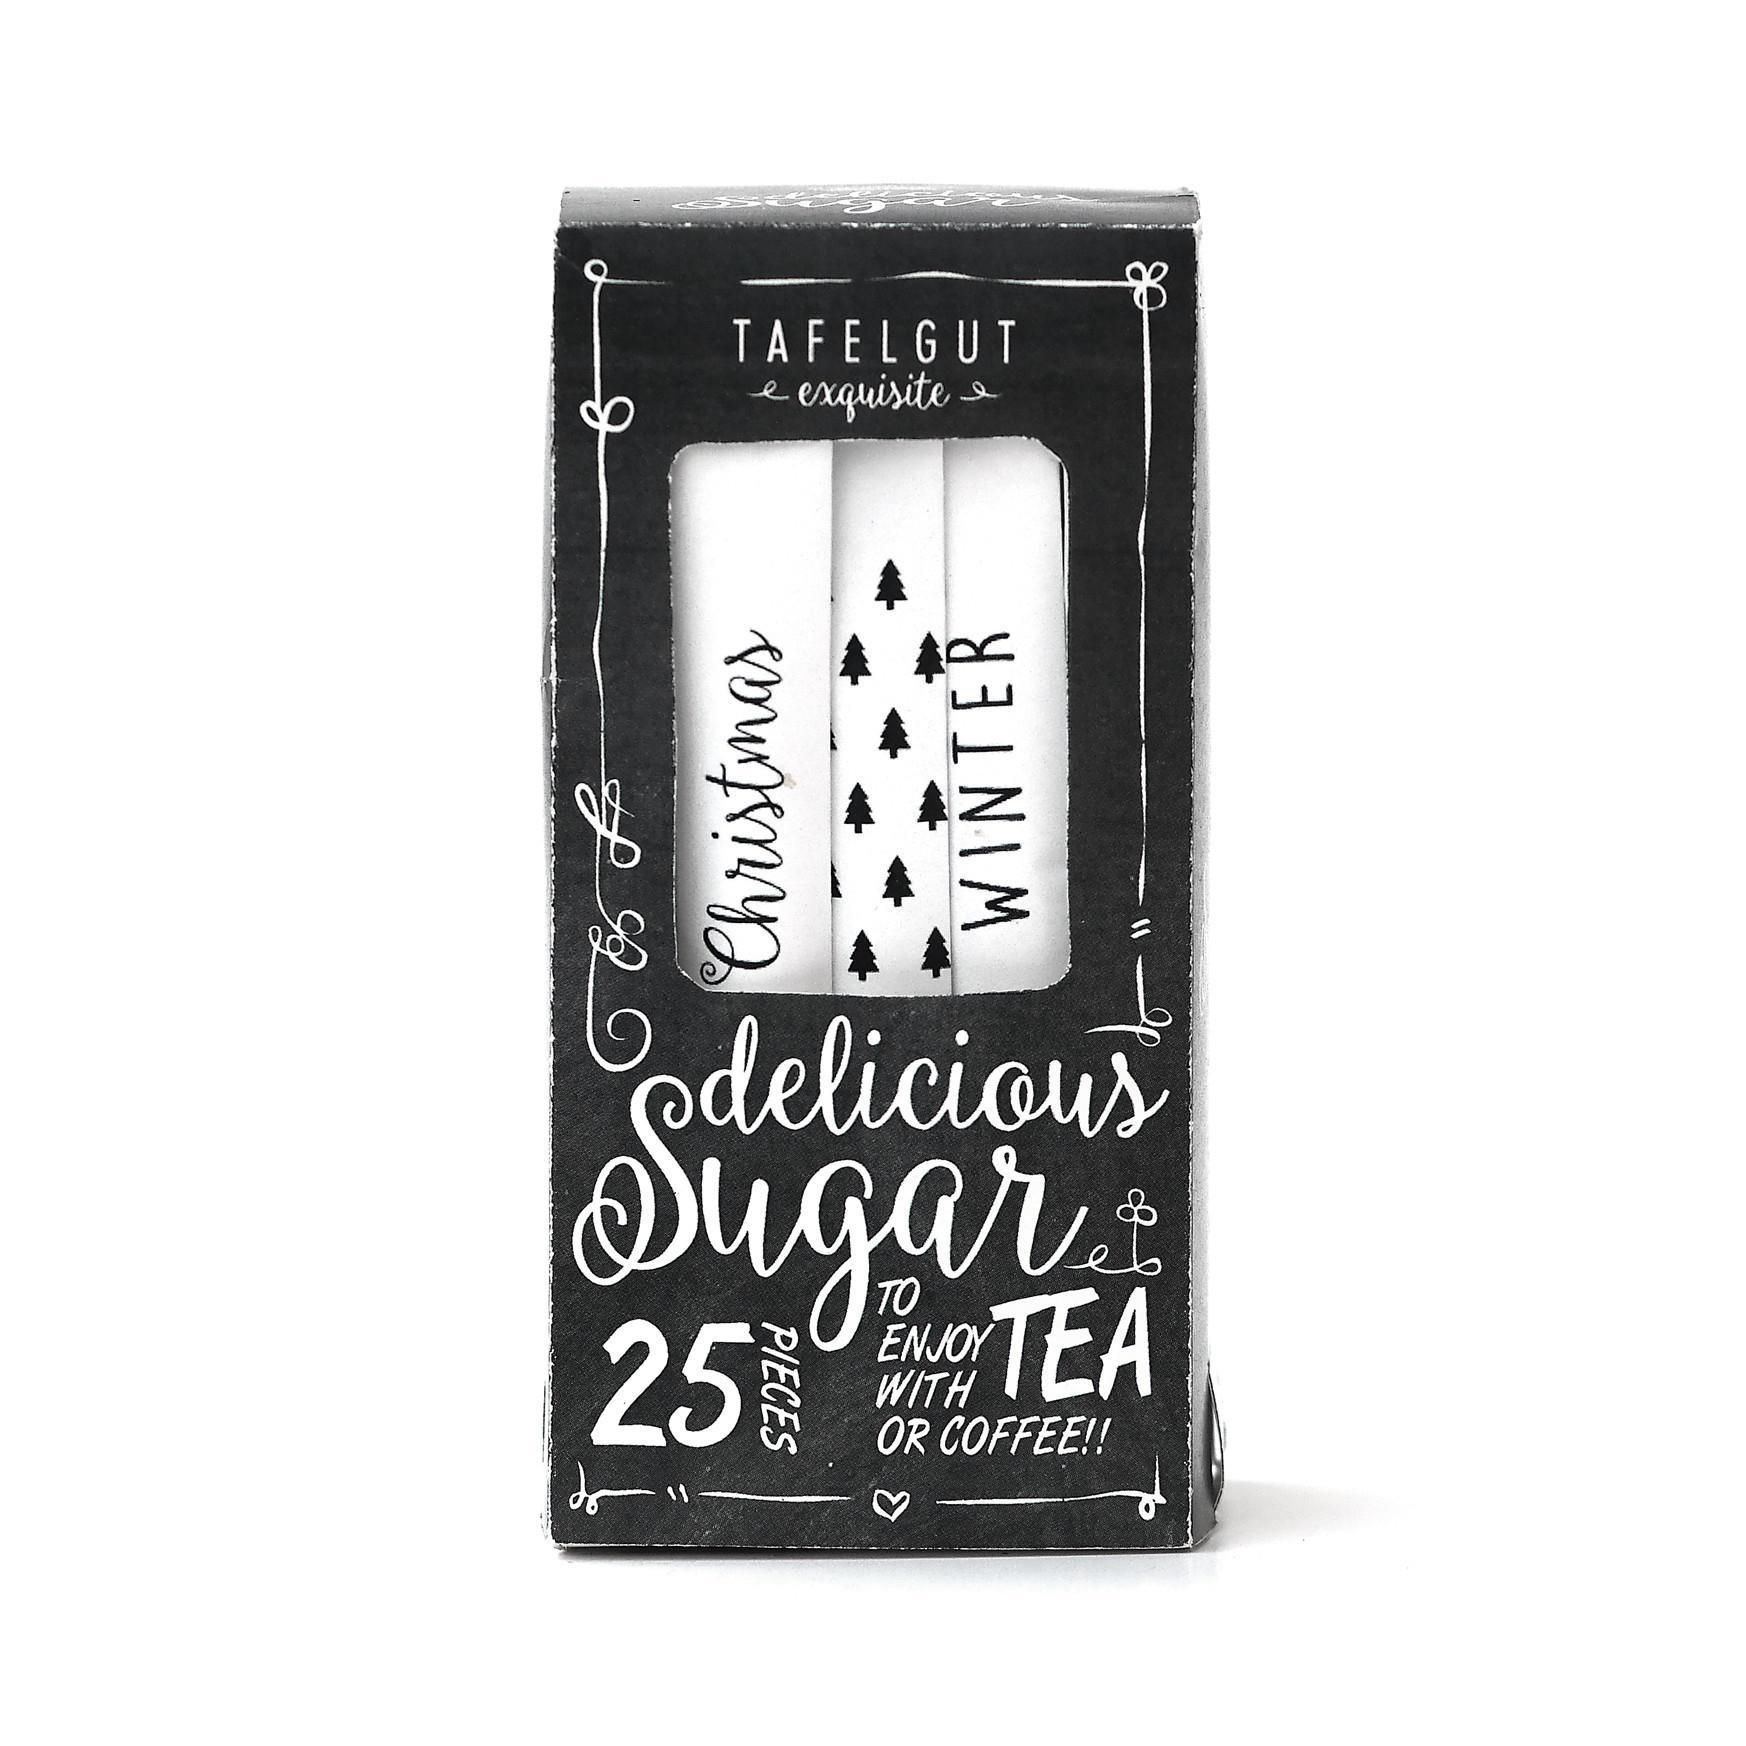 TAFELGUT Bílý cukr v sáčcích Christmas winter - 25 x 5gr